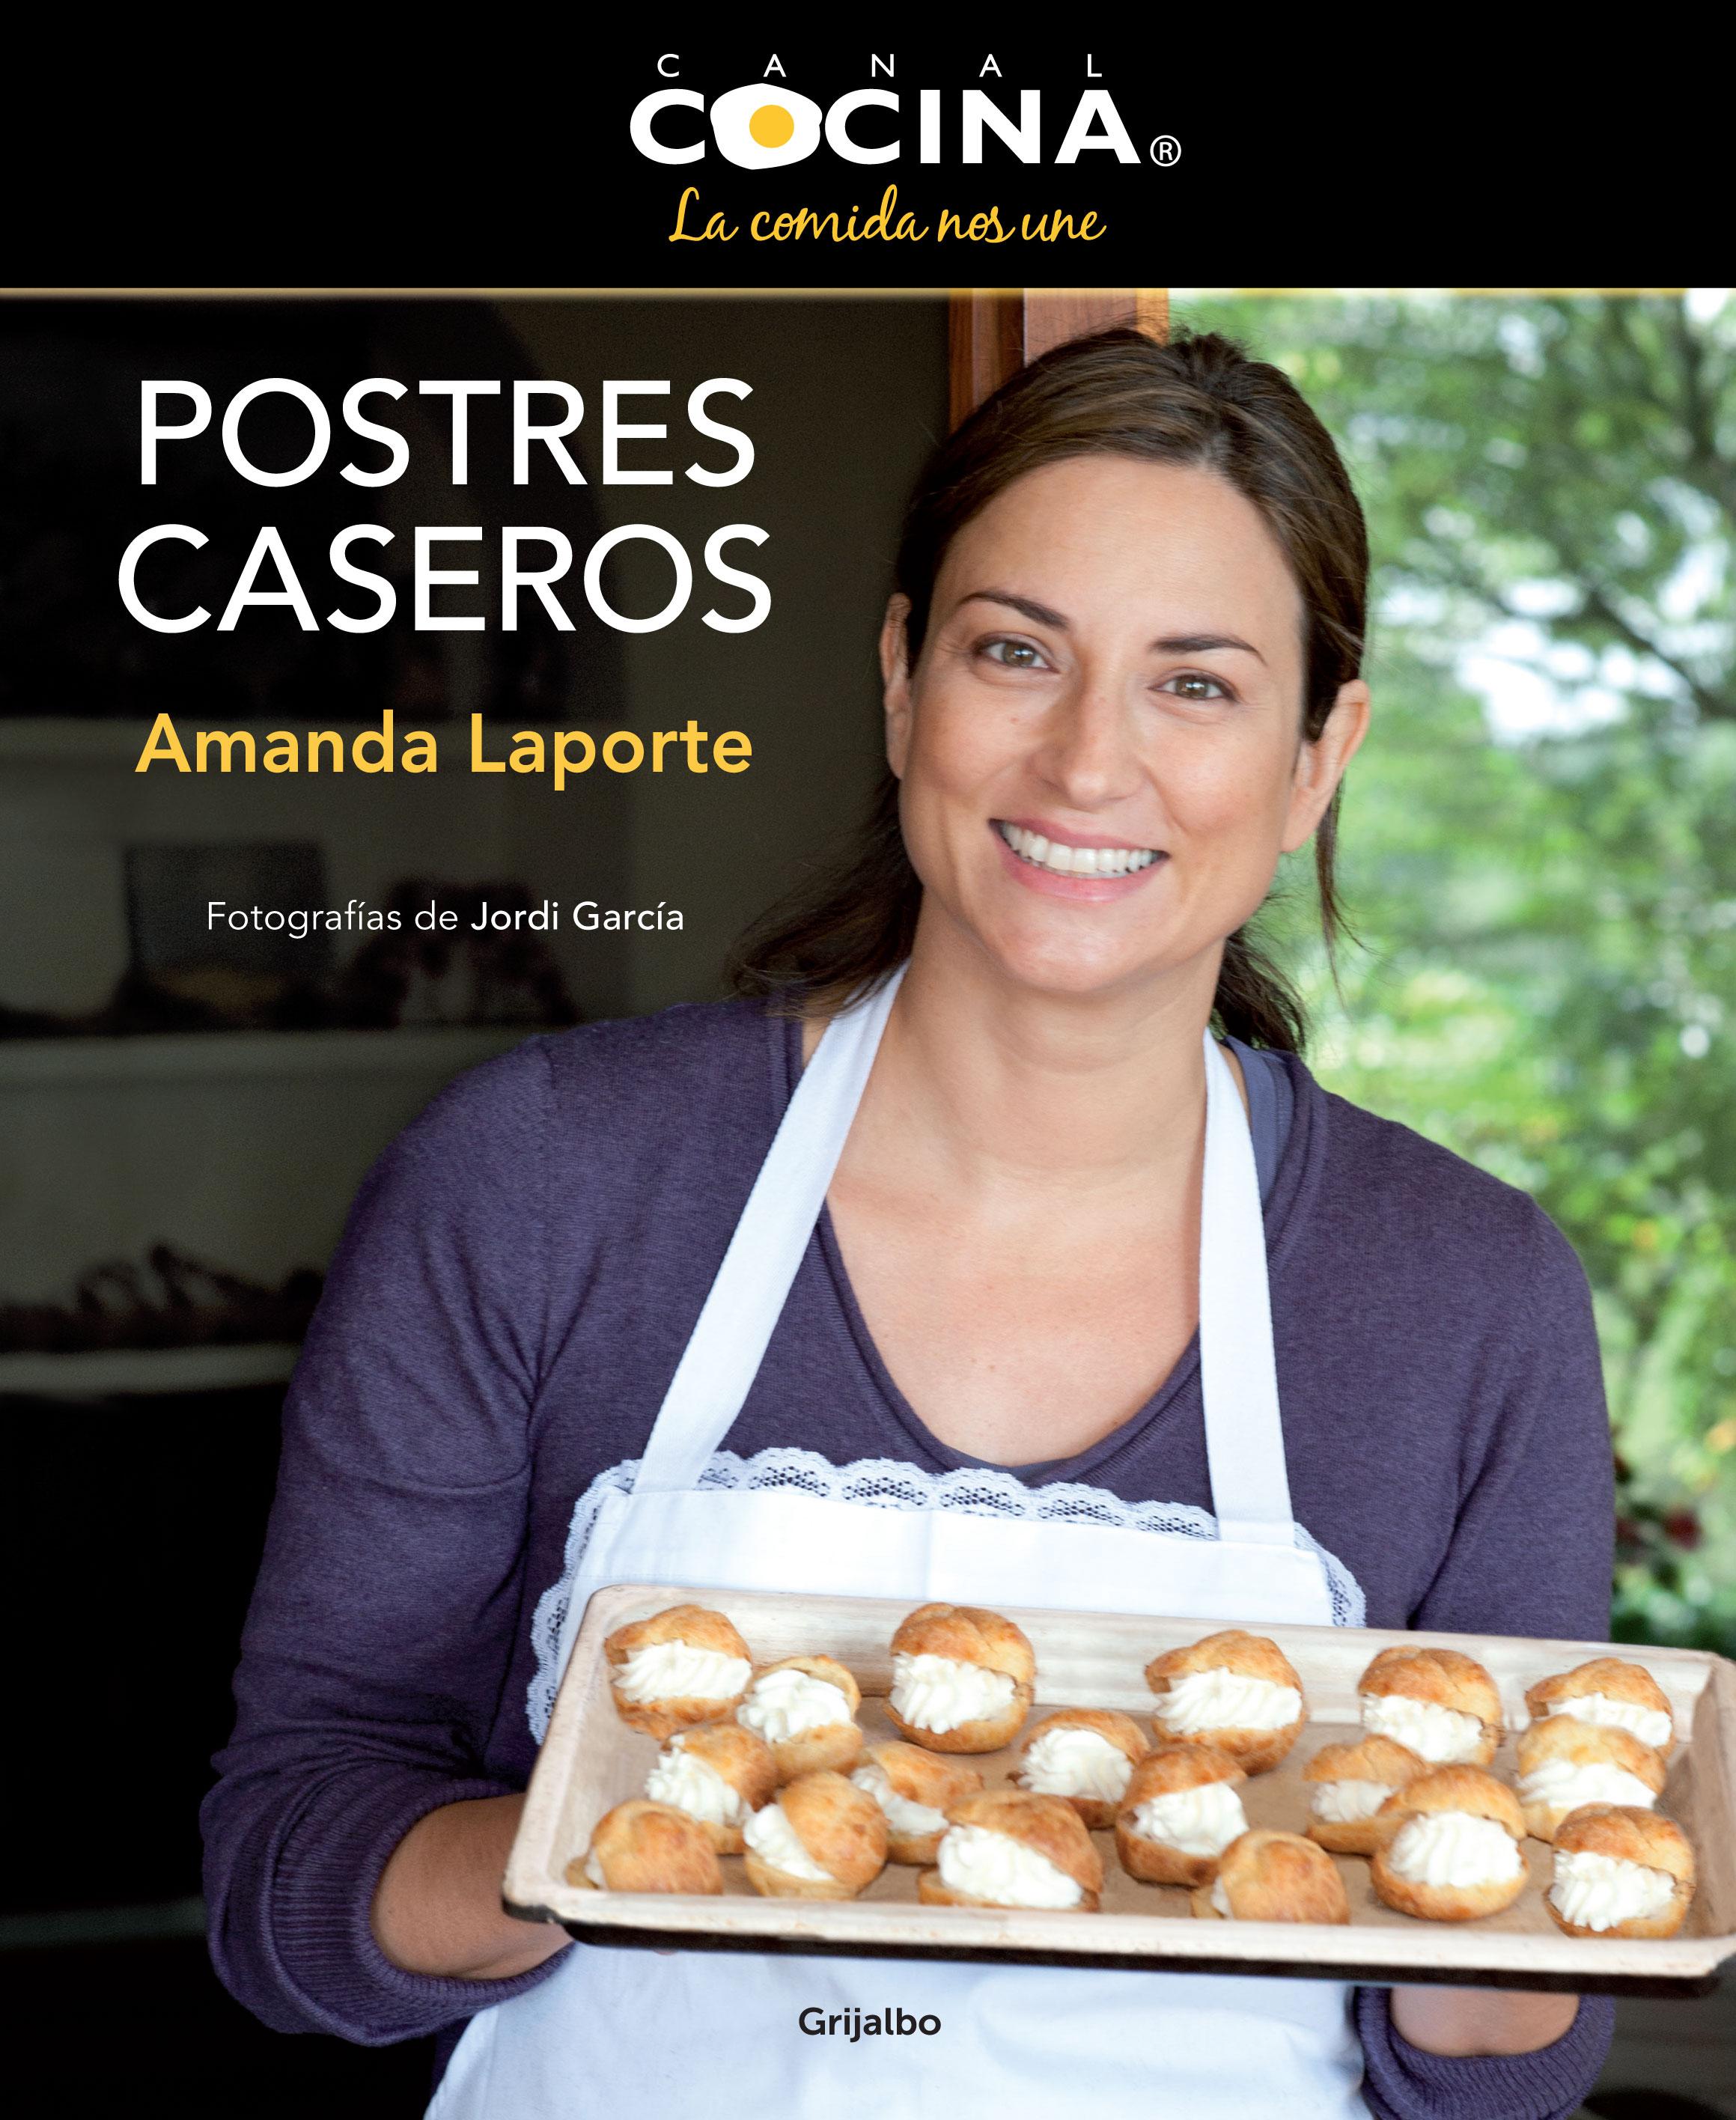 Los postres de amanda laporte en canal cocina noticias for Canal cocina cocina de familia